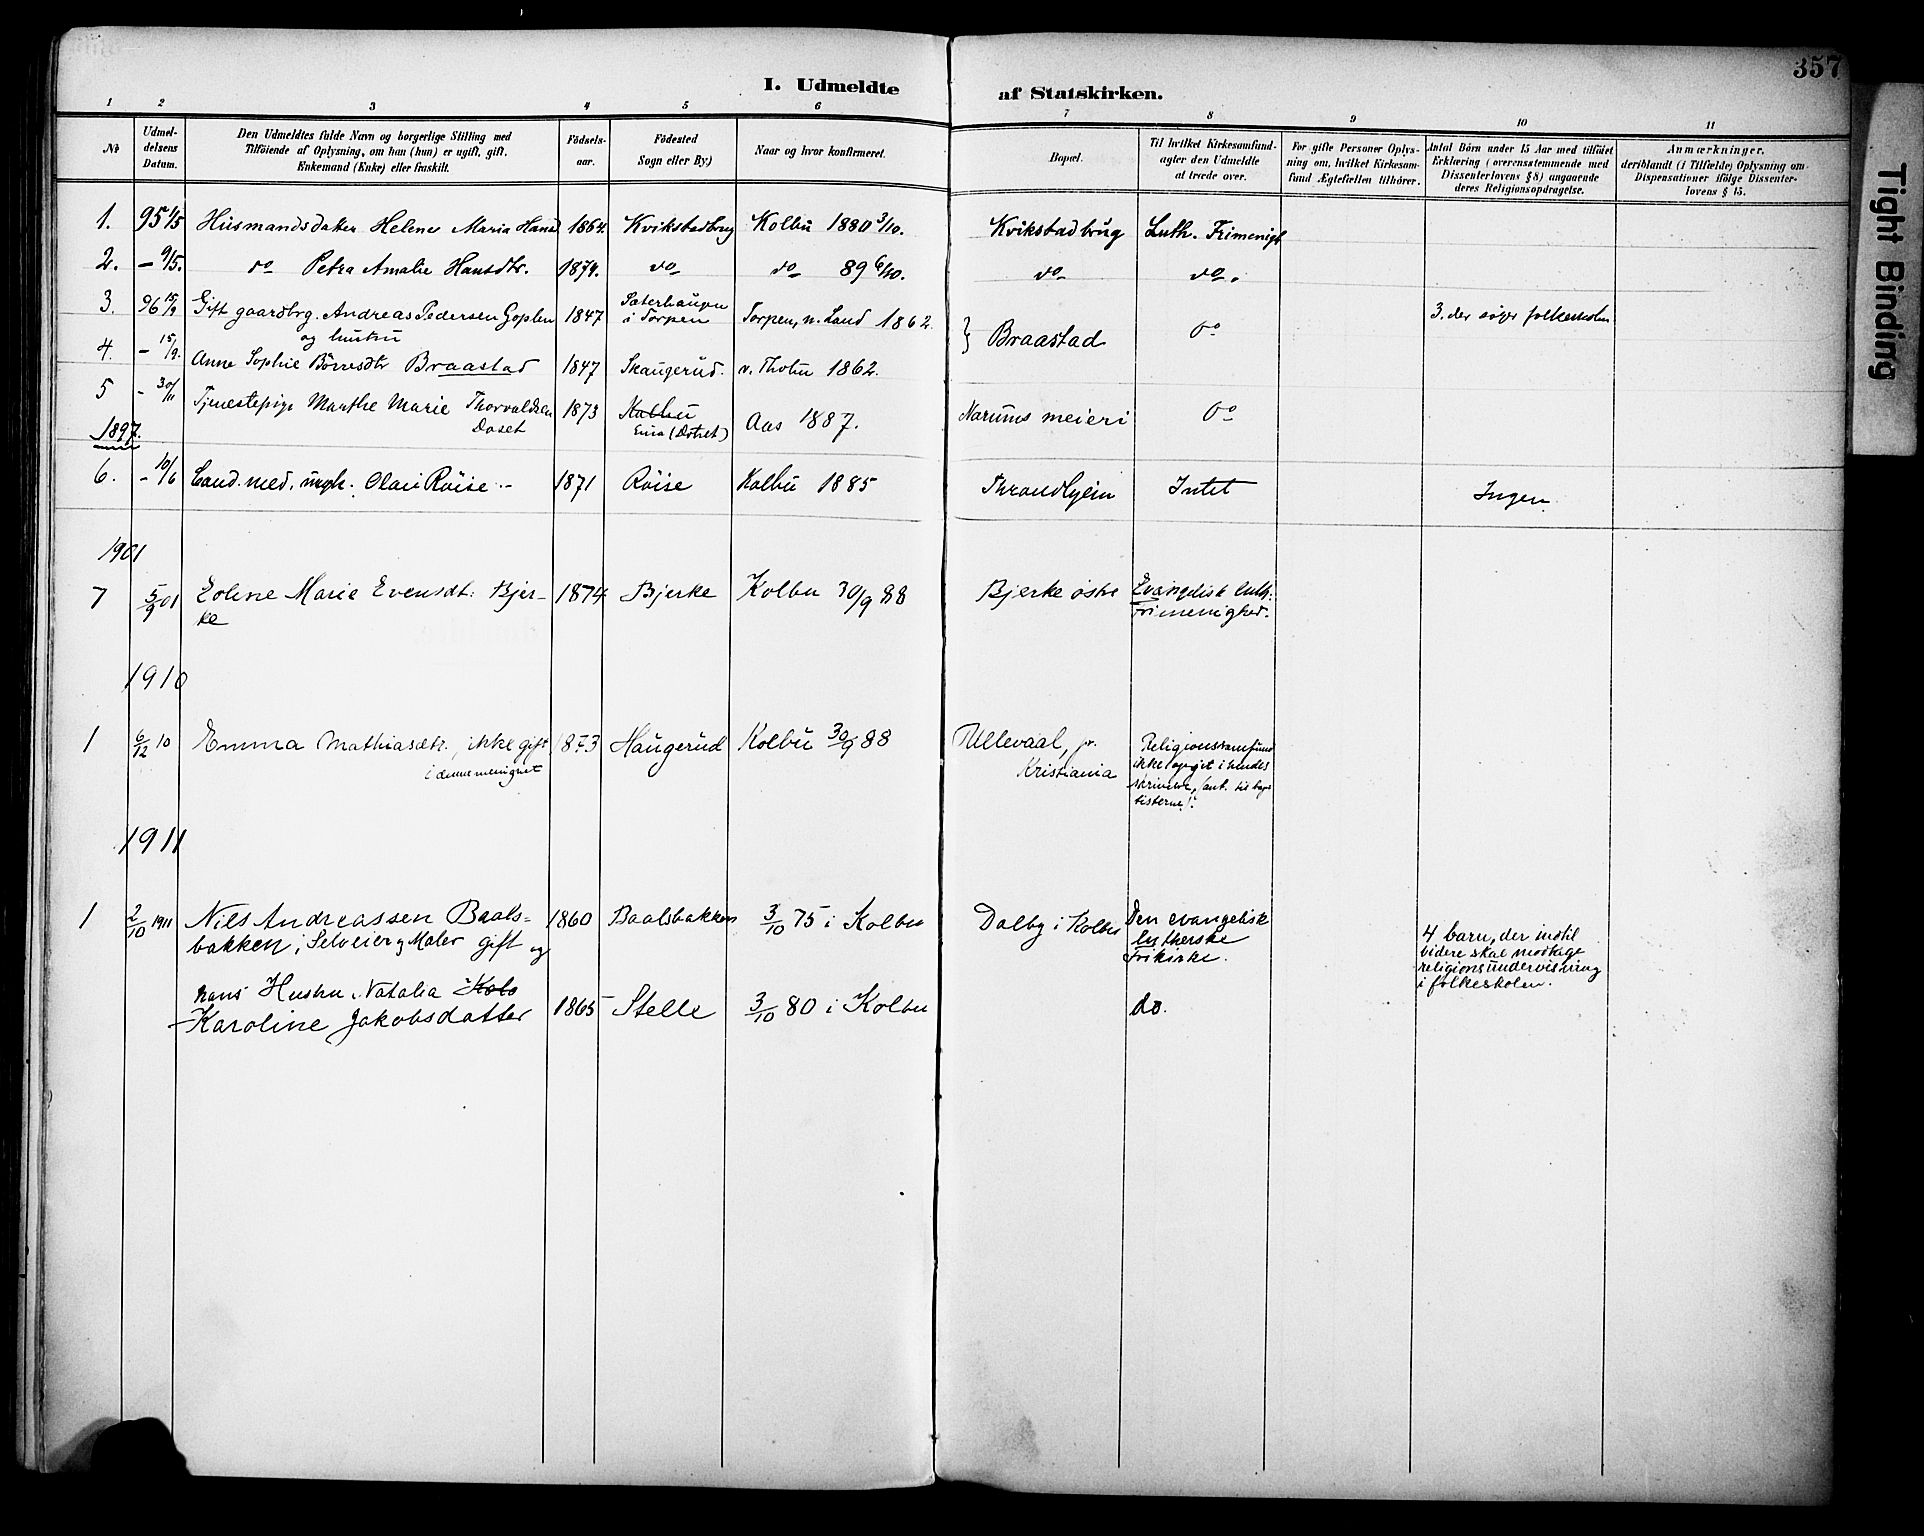 SAH, Vestre Toten prestekontor, H/Ha/Haa/L0013: Ministerialbok nr. 13, 1895-1911, s. 357